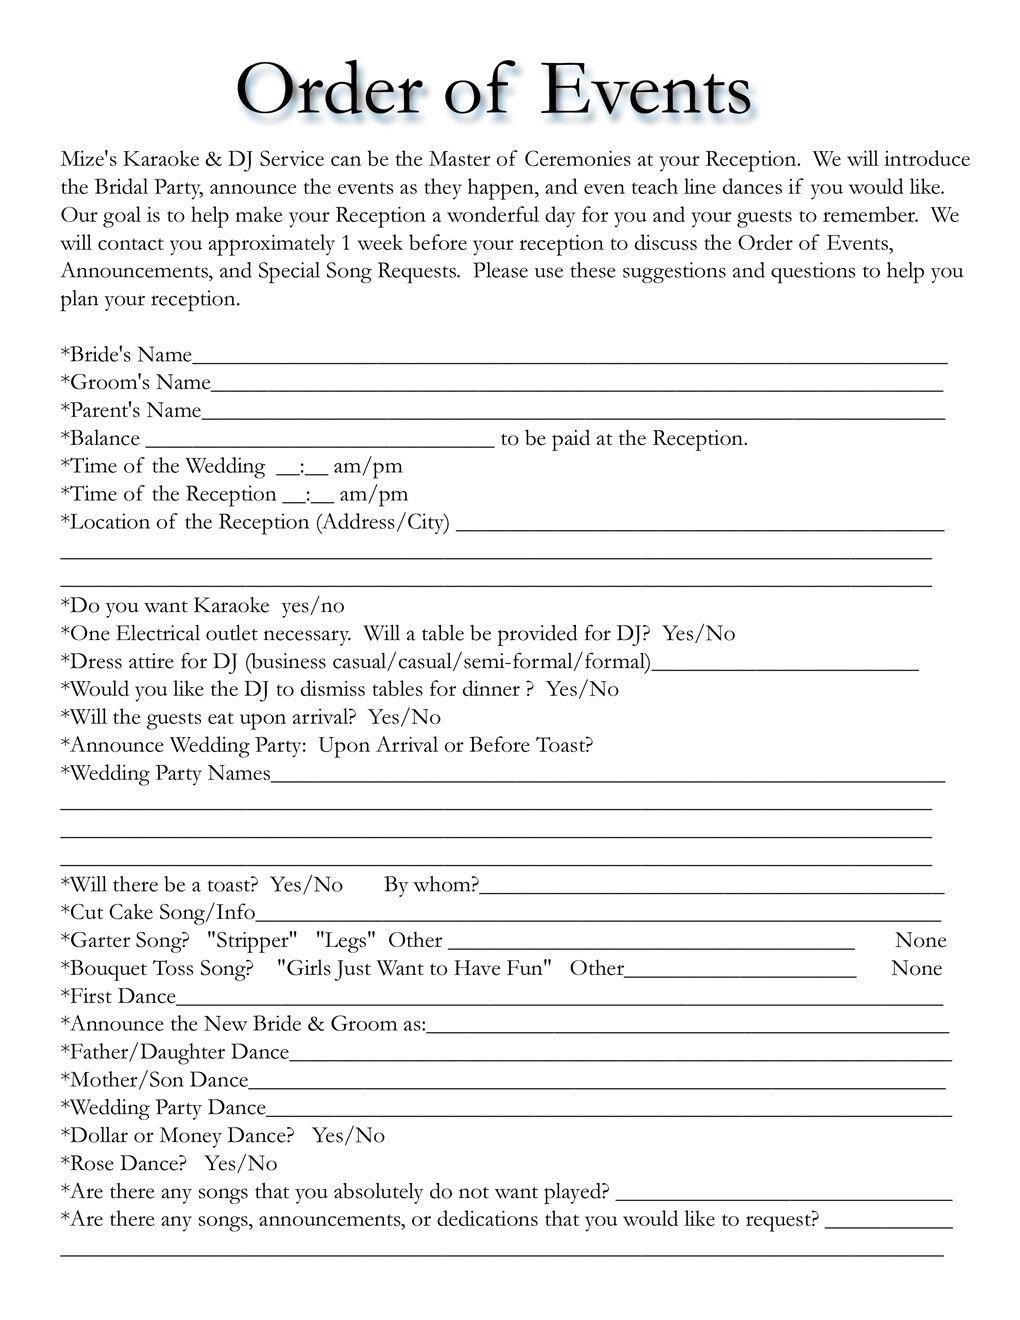 Wedding Itinerary Templates Free Wedding Itinerary Templates Free